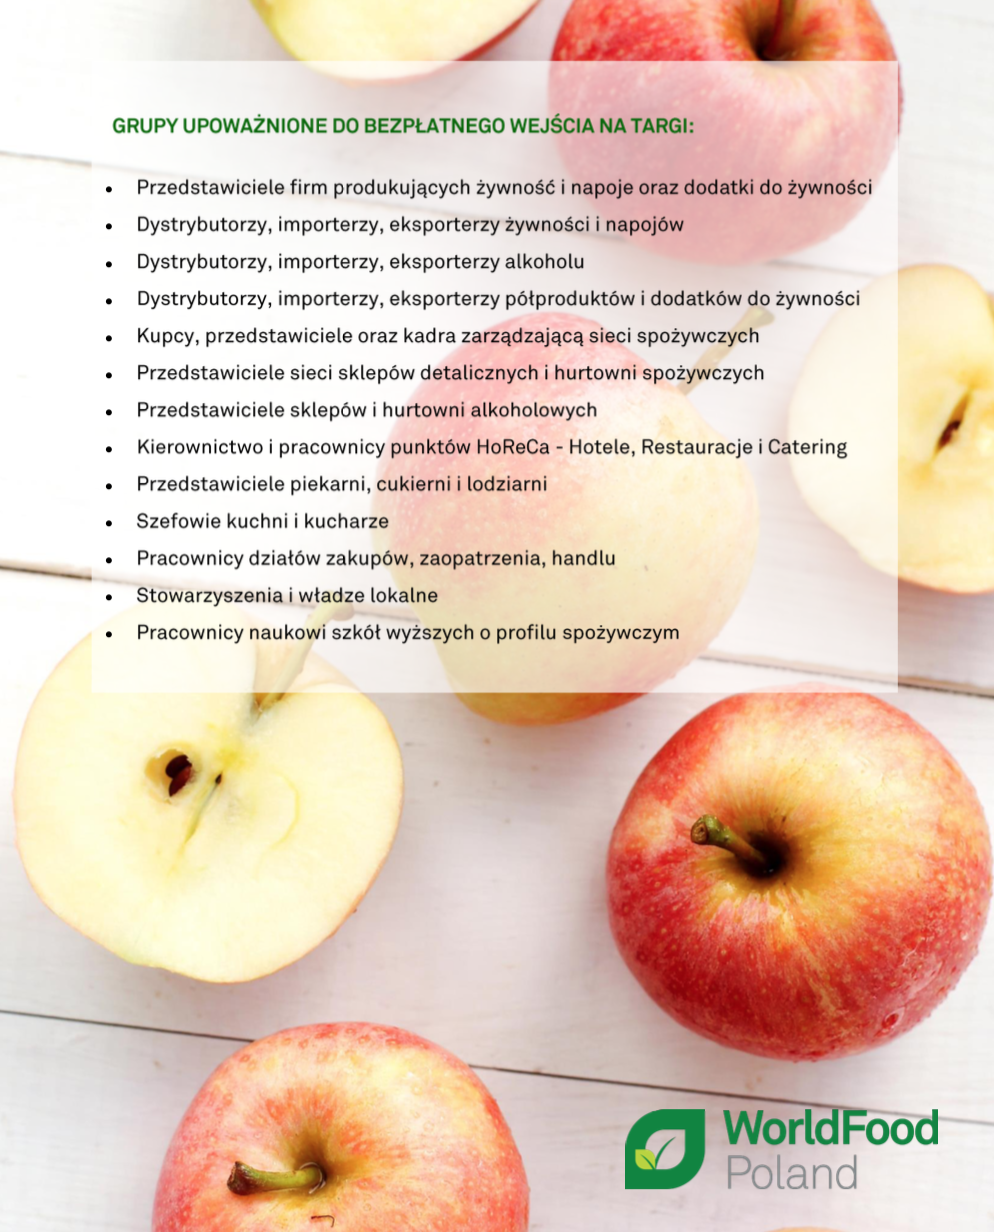 World-Food-2019-hipoalergiczni-4